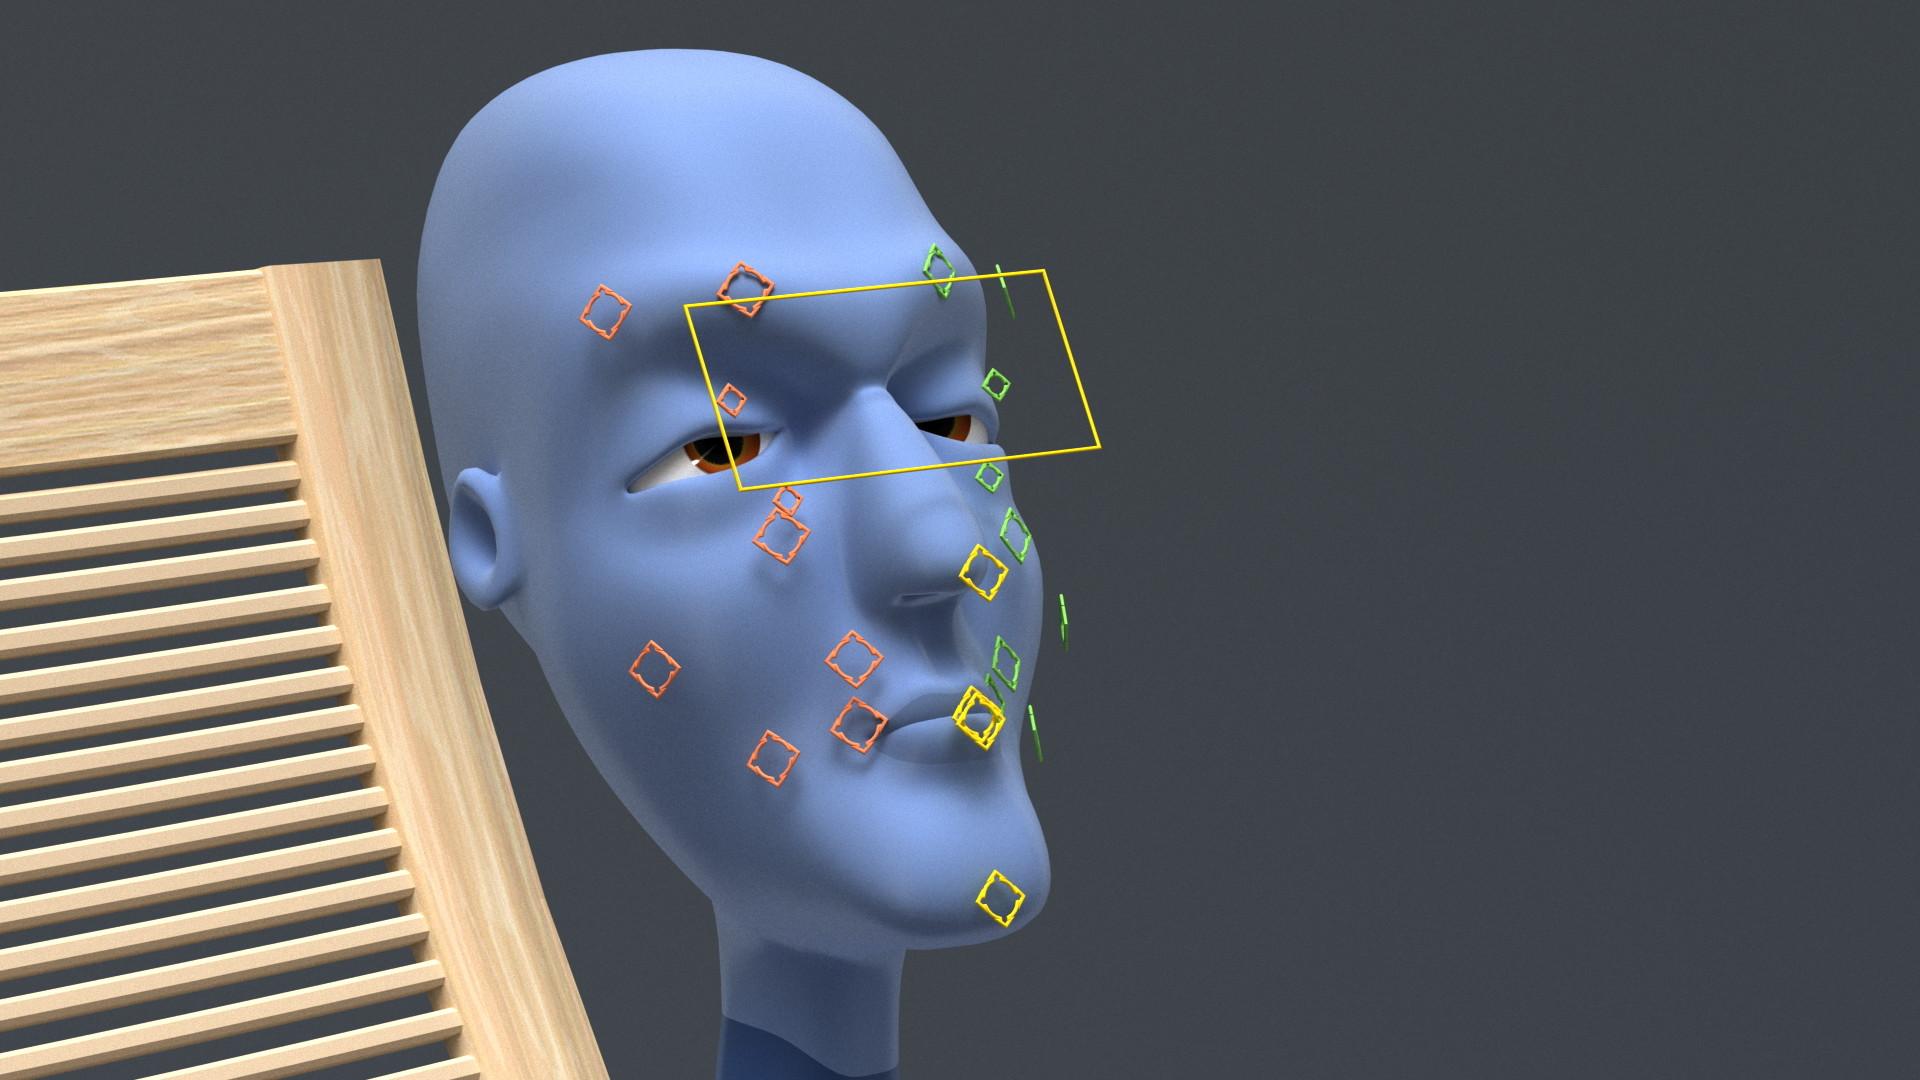 Eugene melnikov shot 3 alien face spline controls 1017 frame